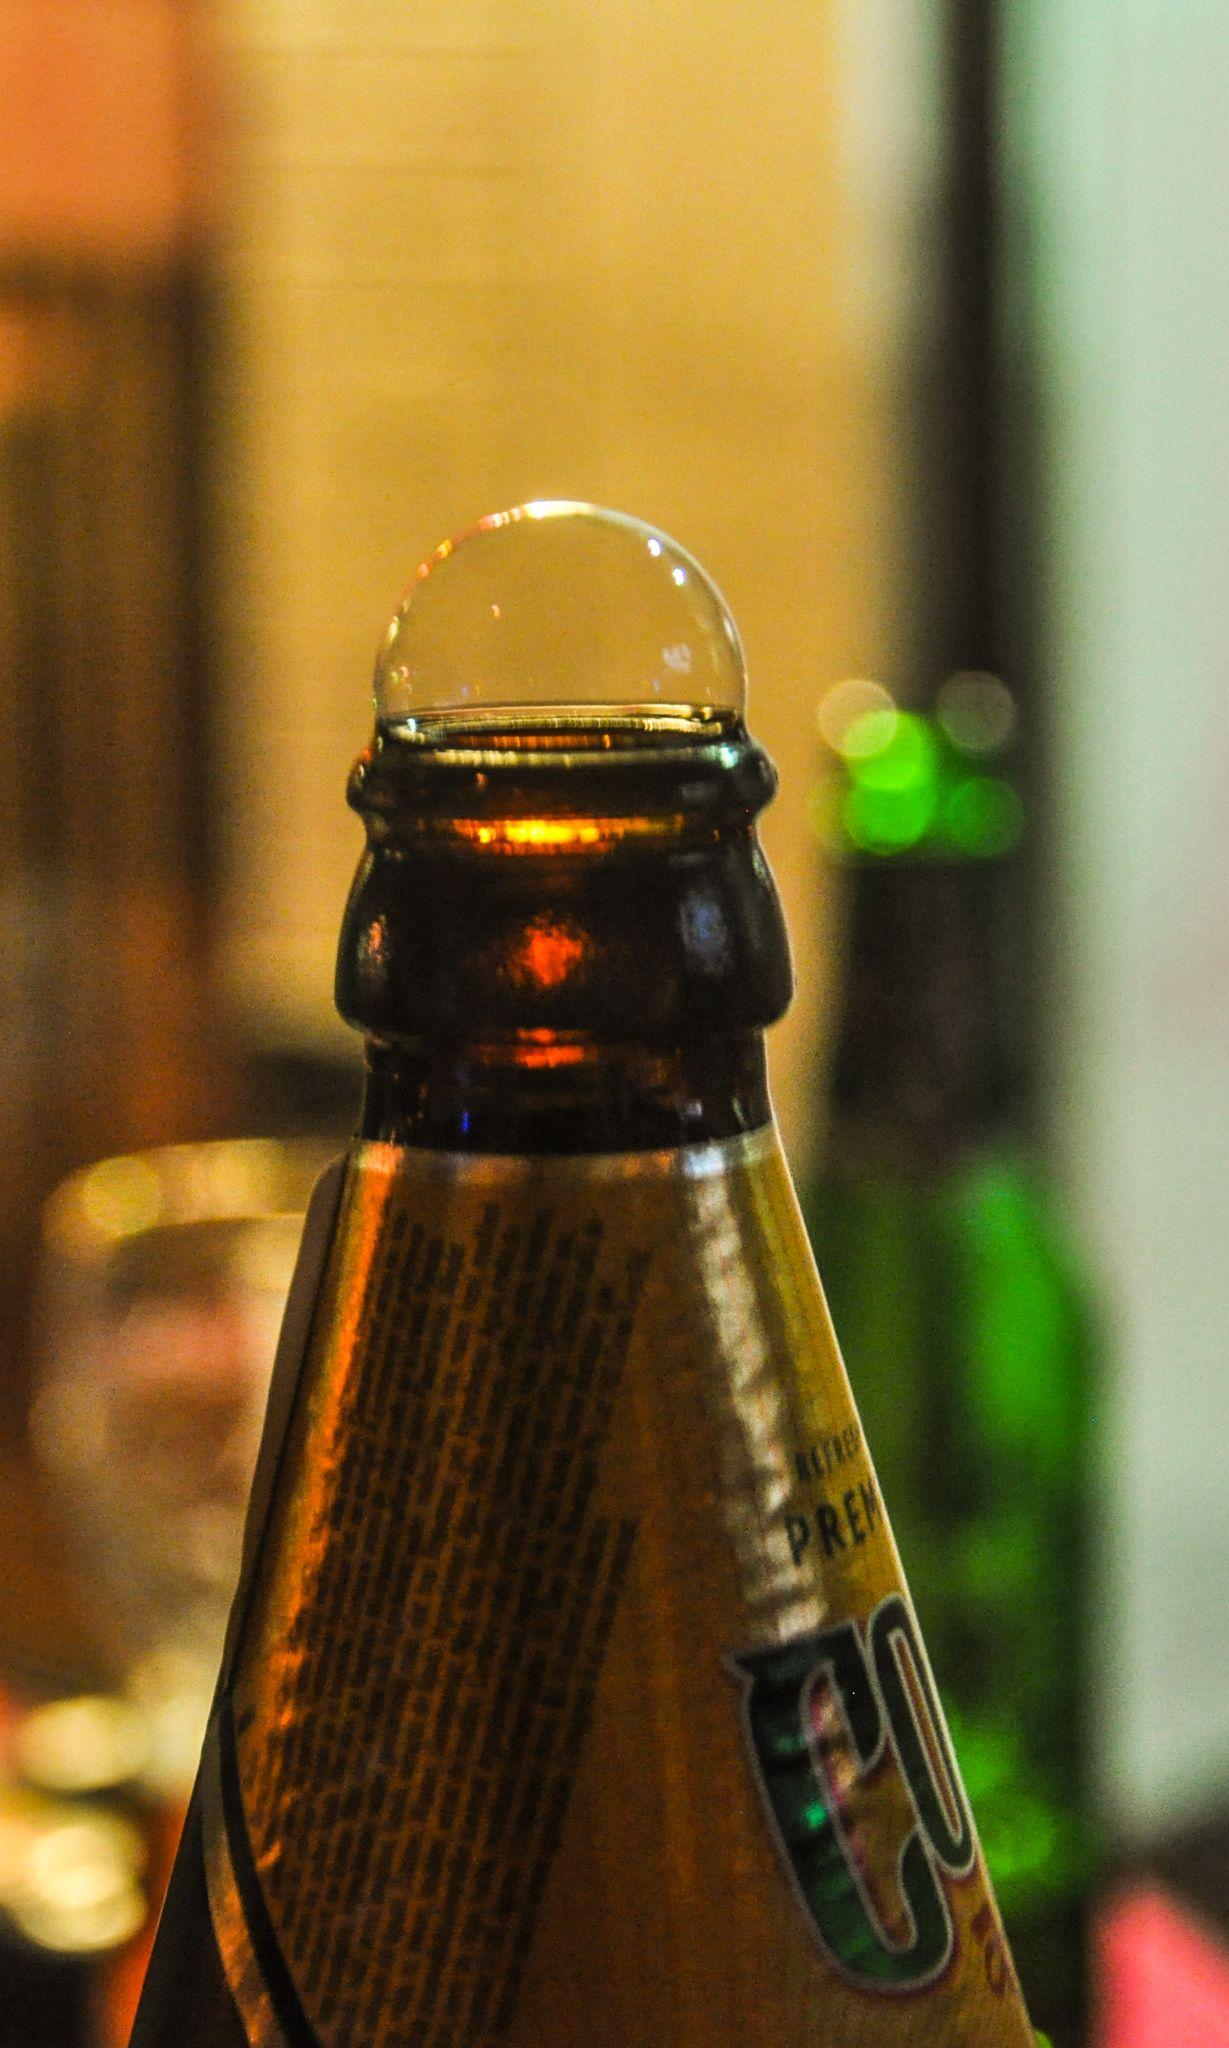 Bubble on bottle by Dimitris Gkoutzamanis